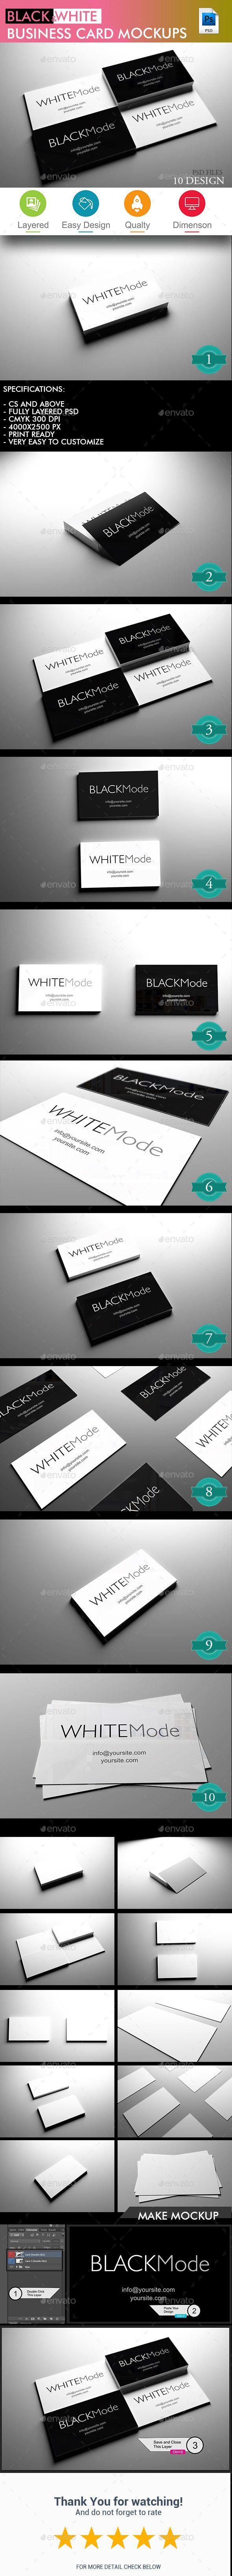 Black & White Business Card Mockup - Volume 2